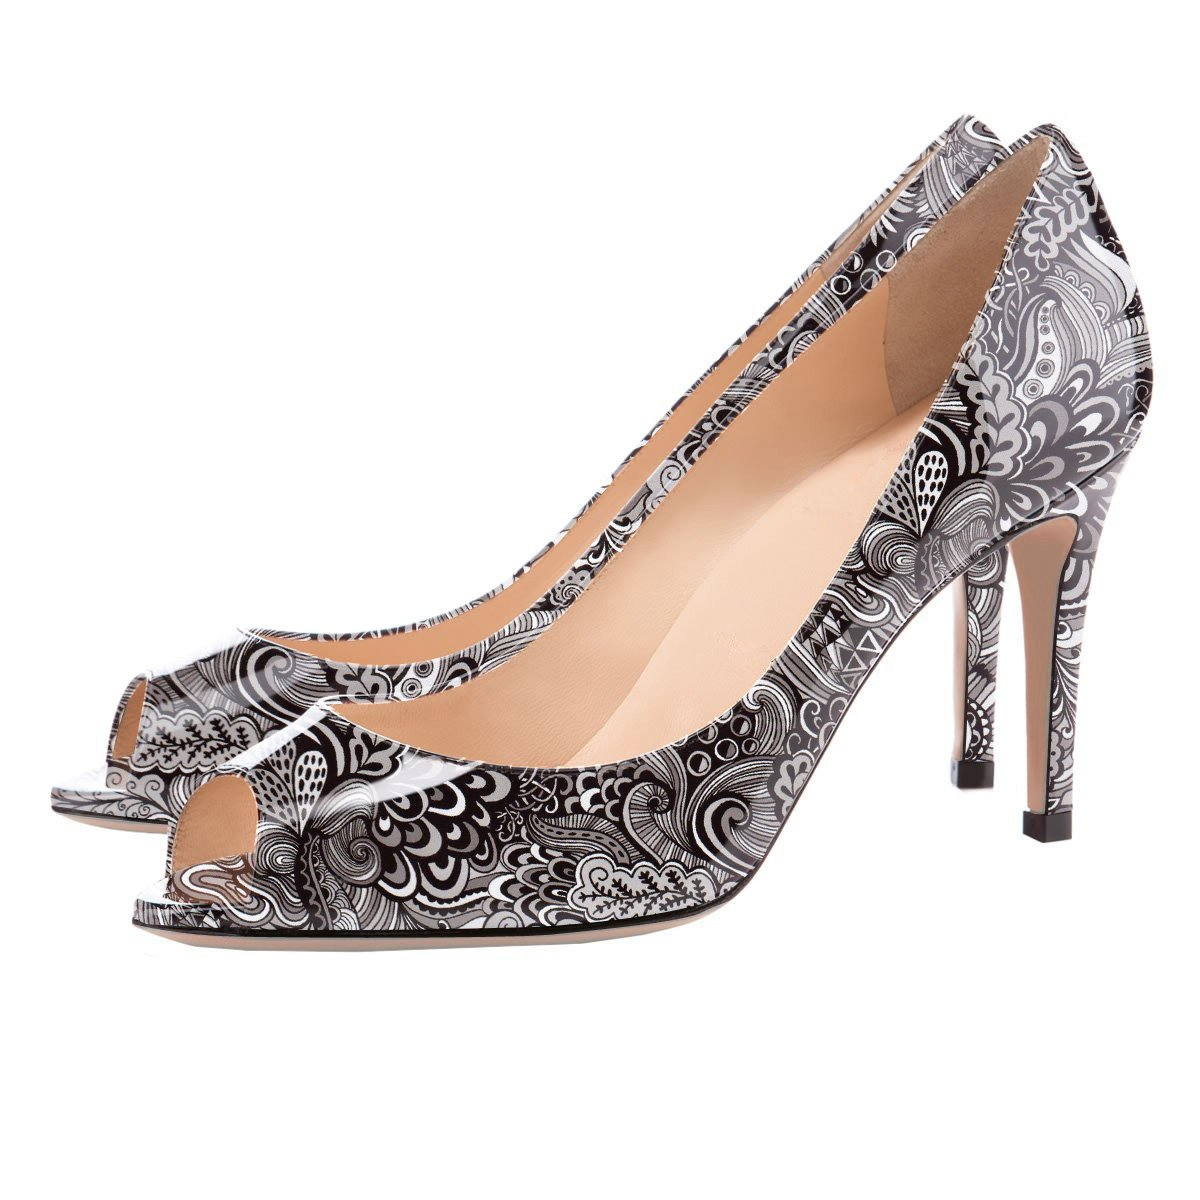 Eldof Women Peep Toe Wedding Pumps Mid-Heel Pumps Formal Wedding Toe Bridal Classic Heel Open Toe Stiletto B07F3VMGC6 12 B(M) US|Gray-pattern 5c014c